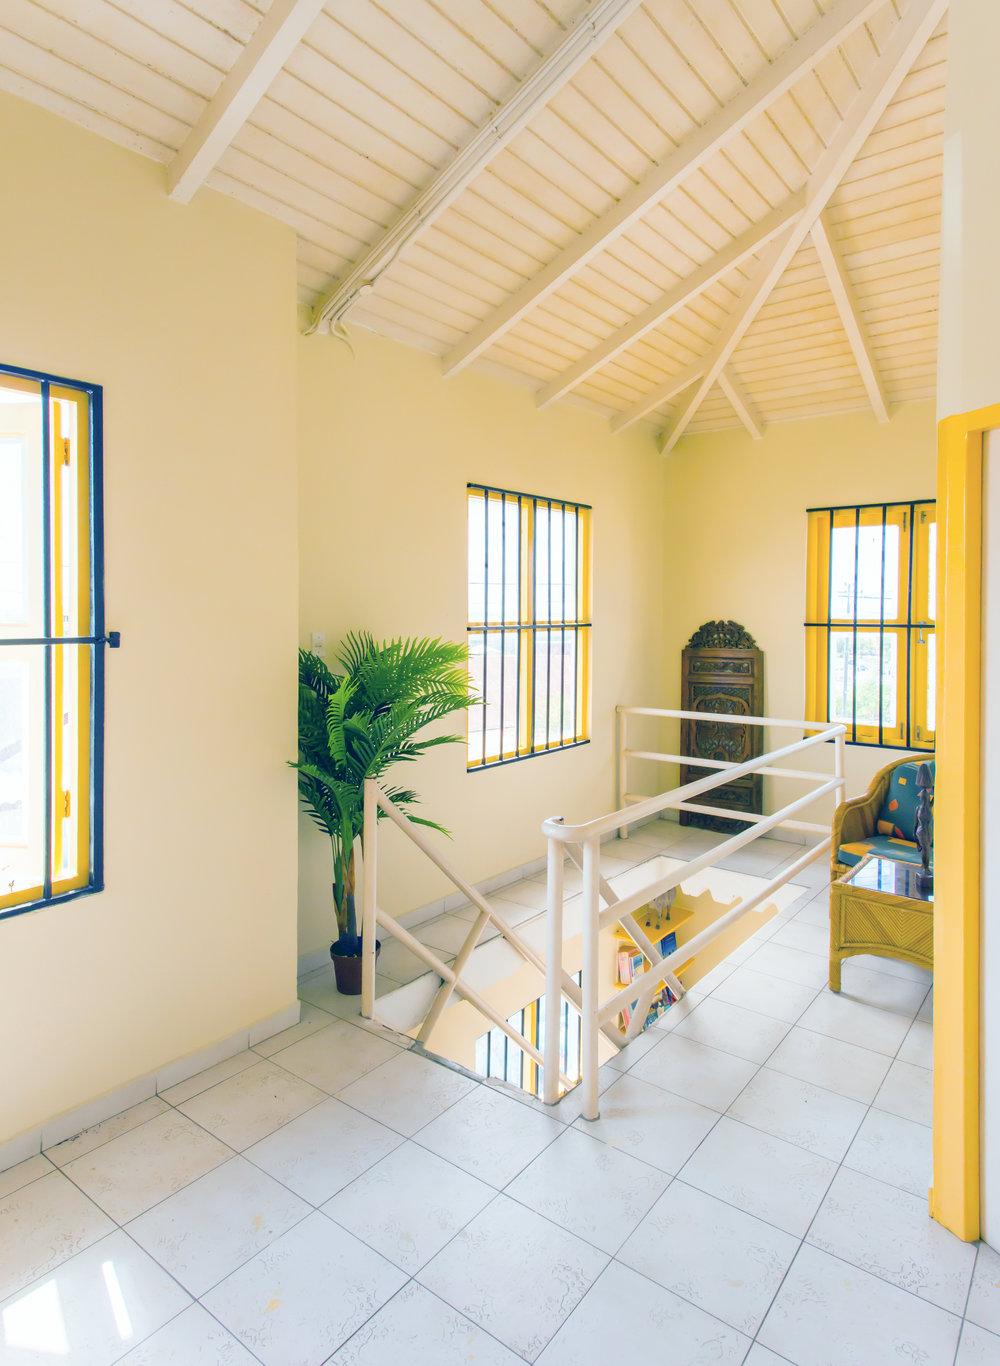 Stagedesk-Curaçao-stagehuis-Flamingo-huis-02.jpg